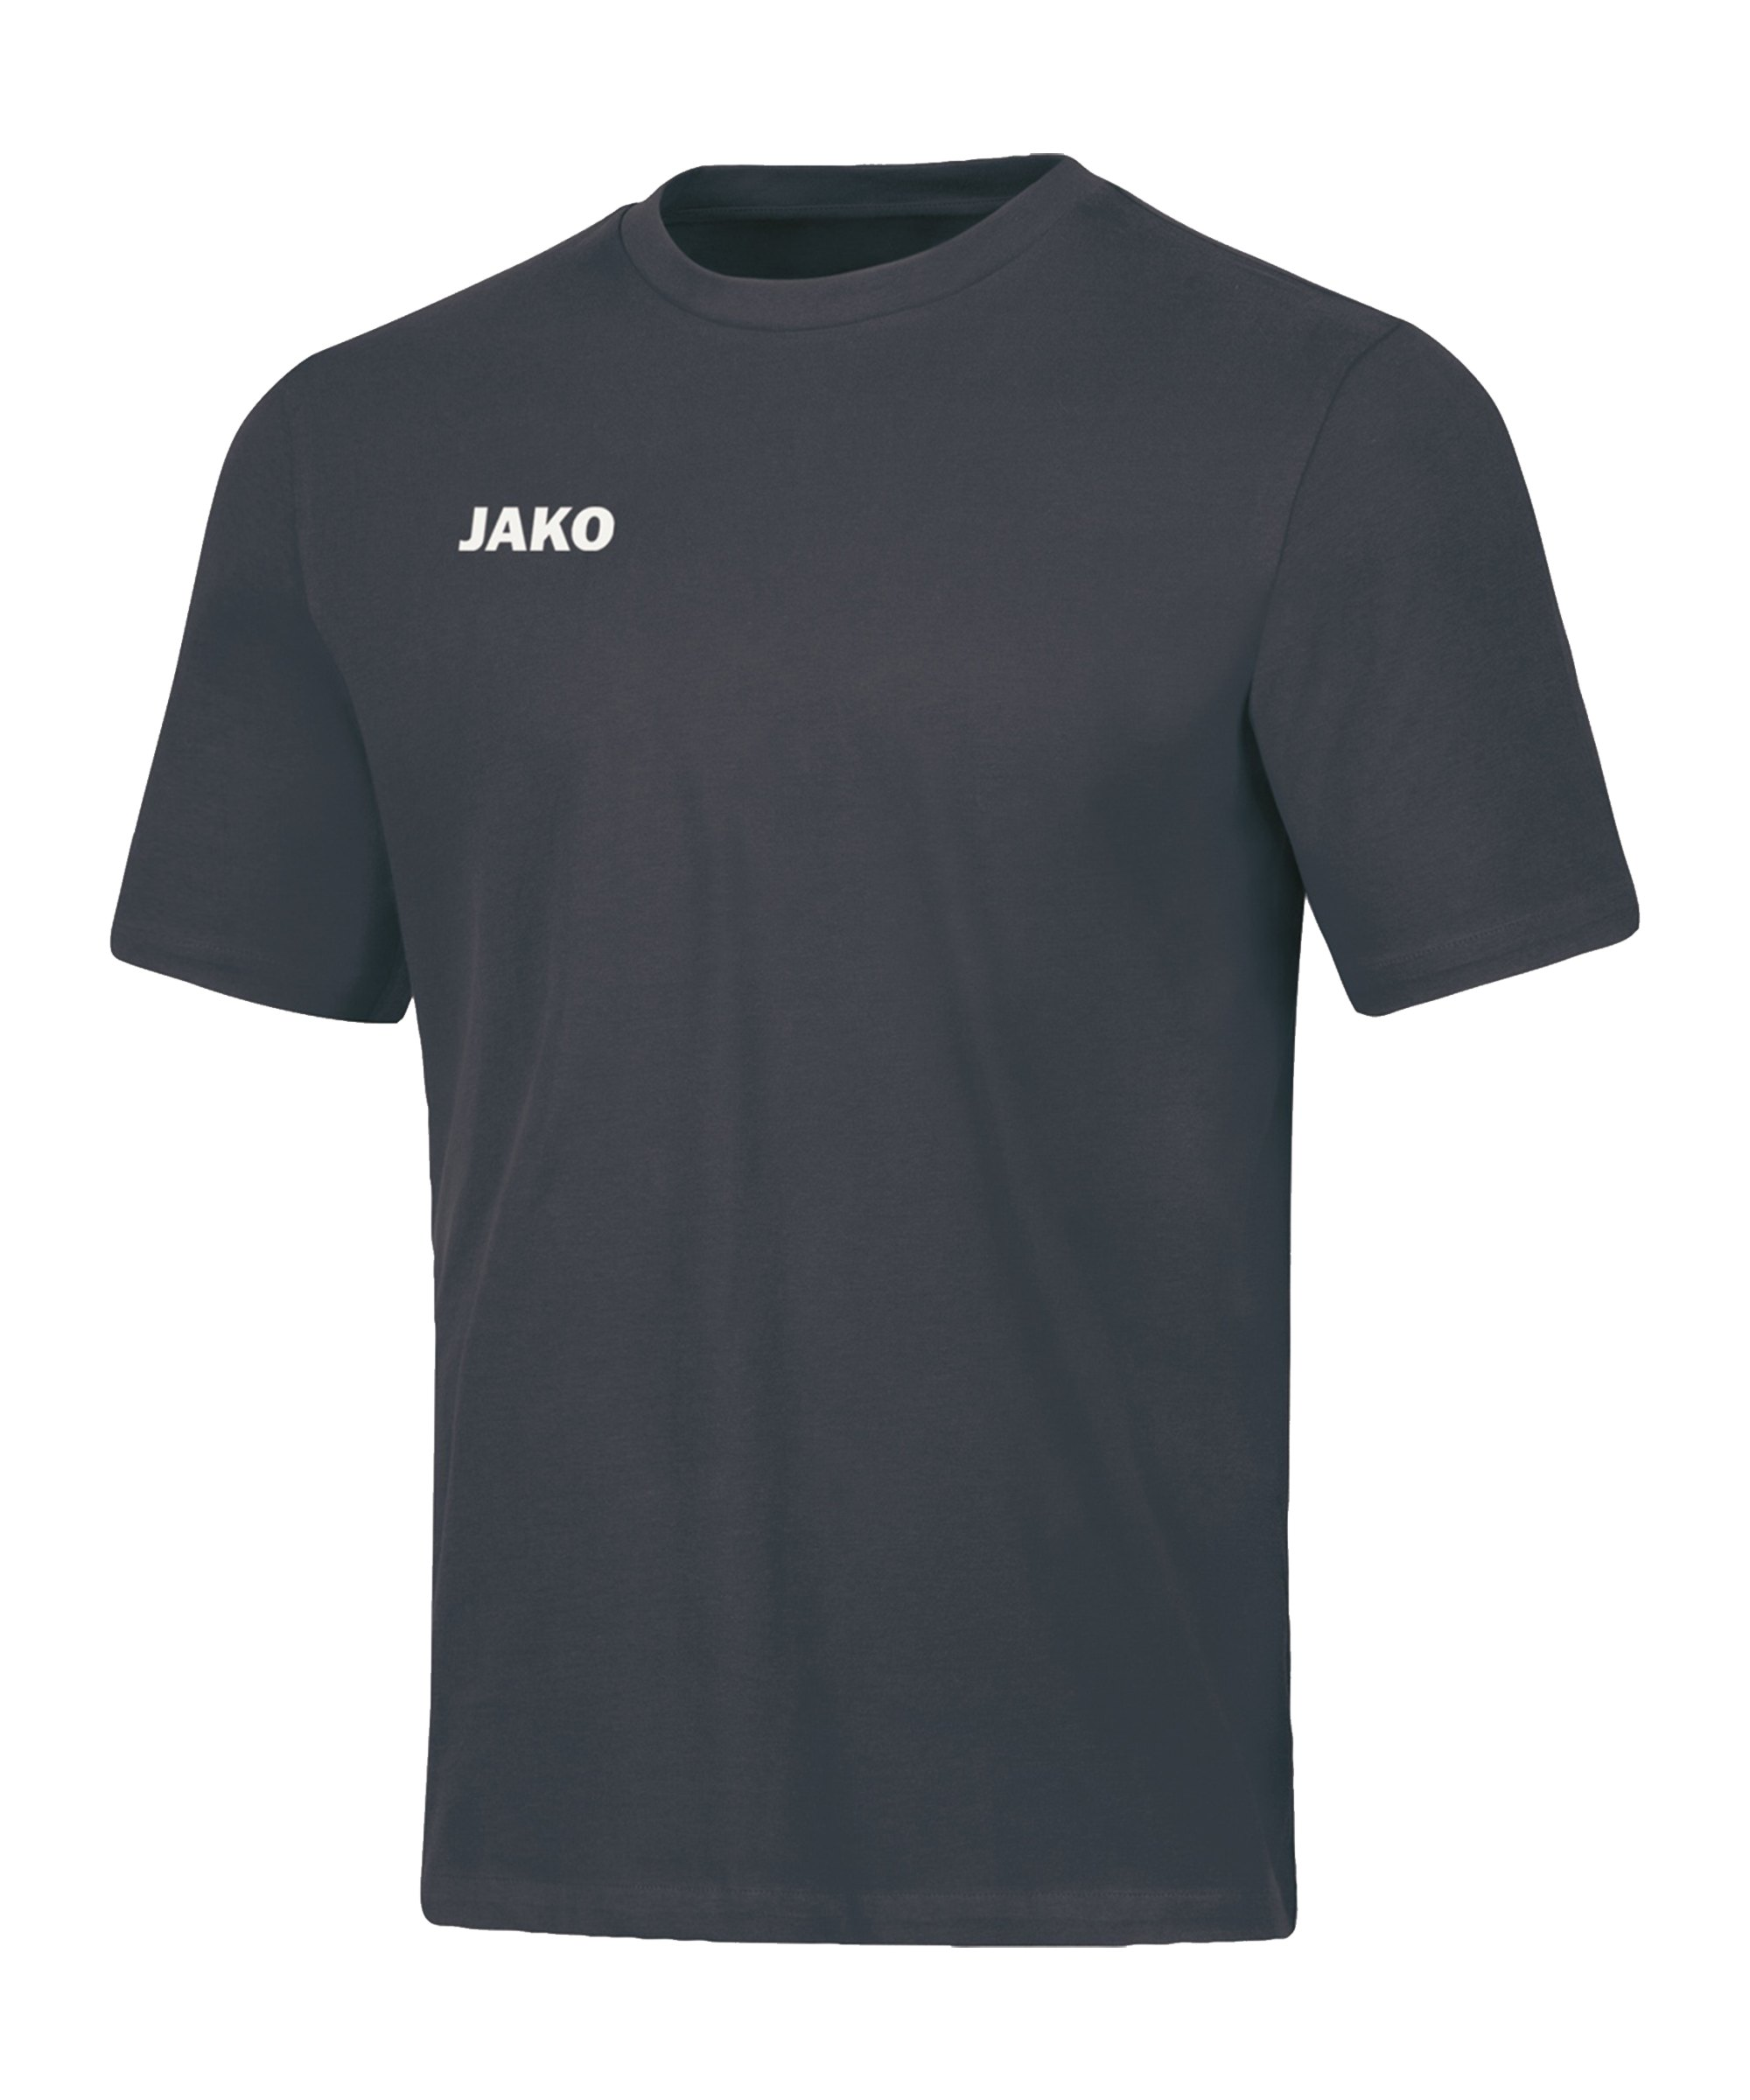 JAKO Base T-Shirt Kids Grau F21 - grau